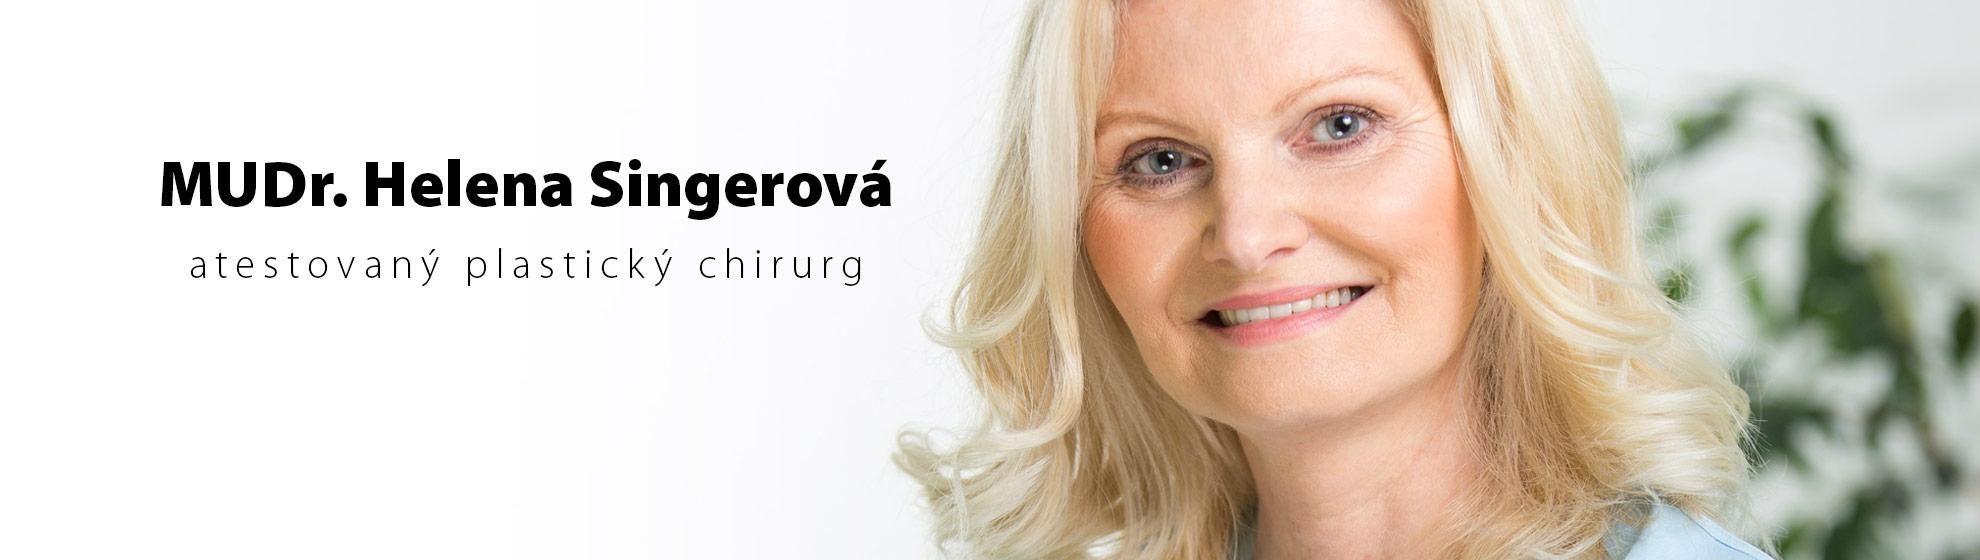 MUDr. Helena Singerová